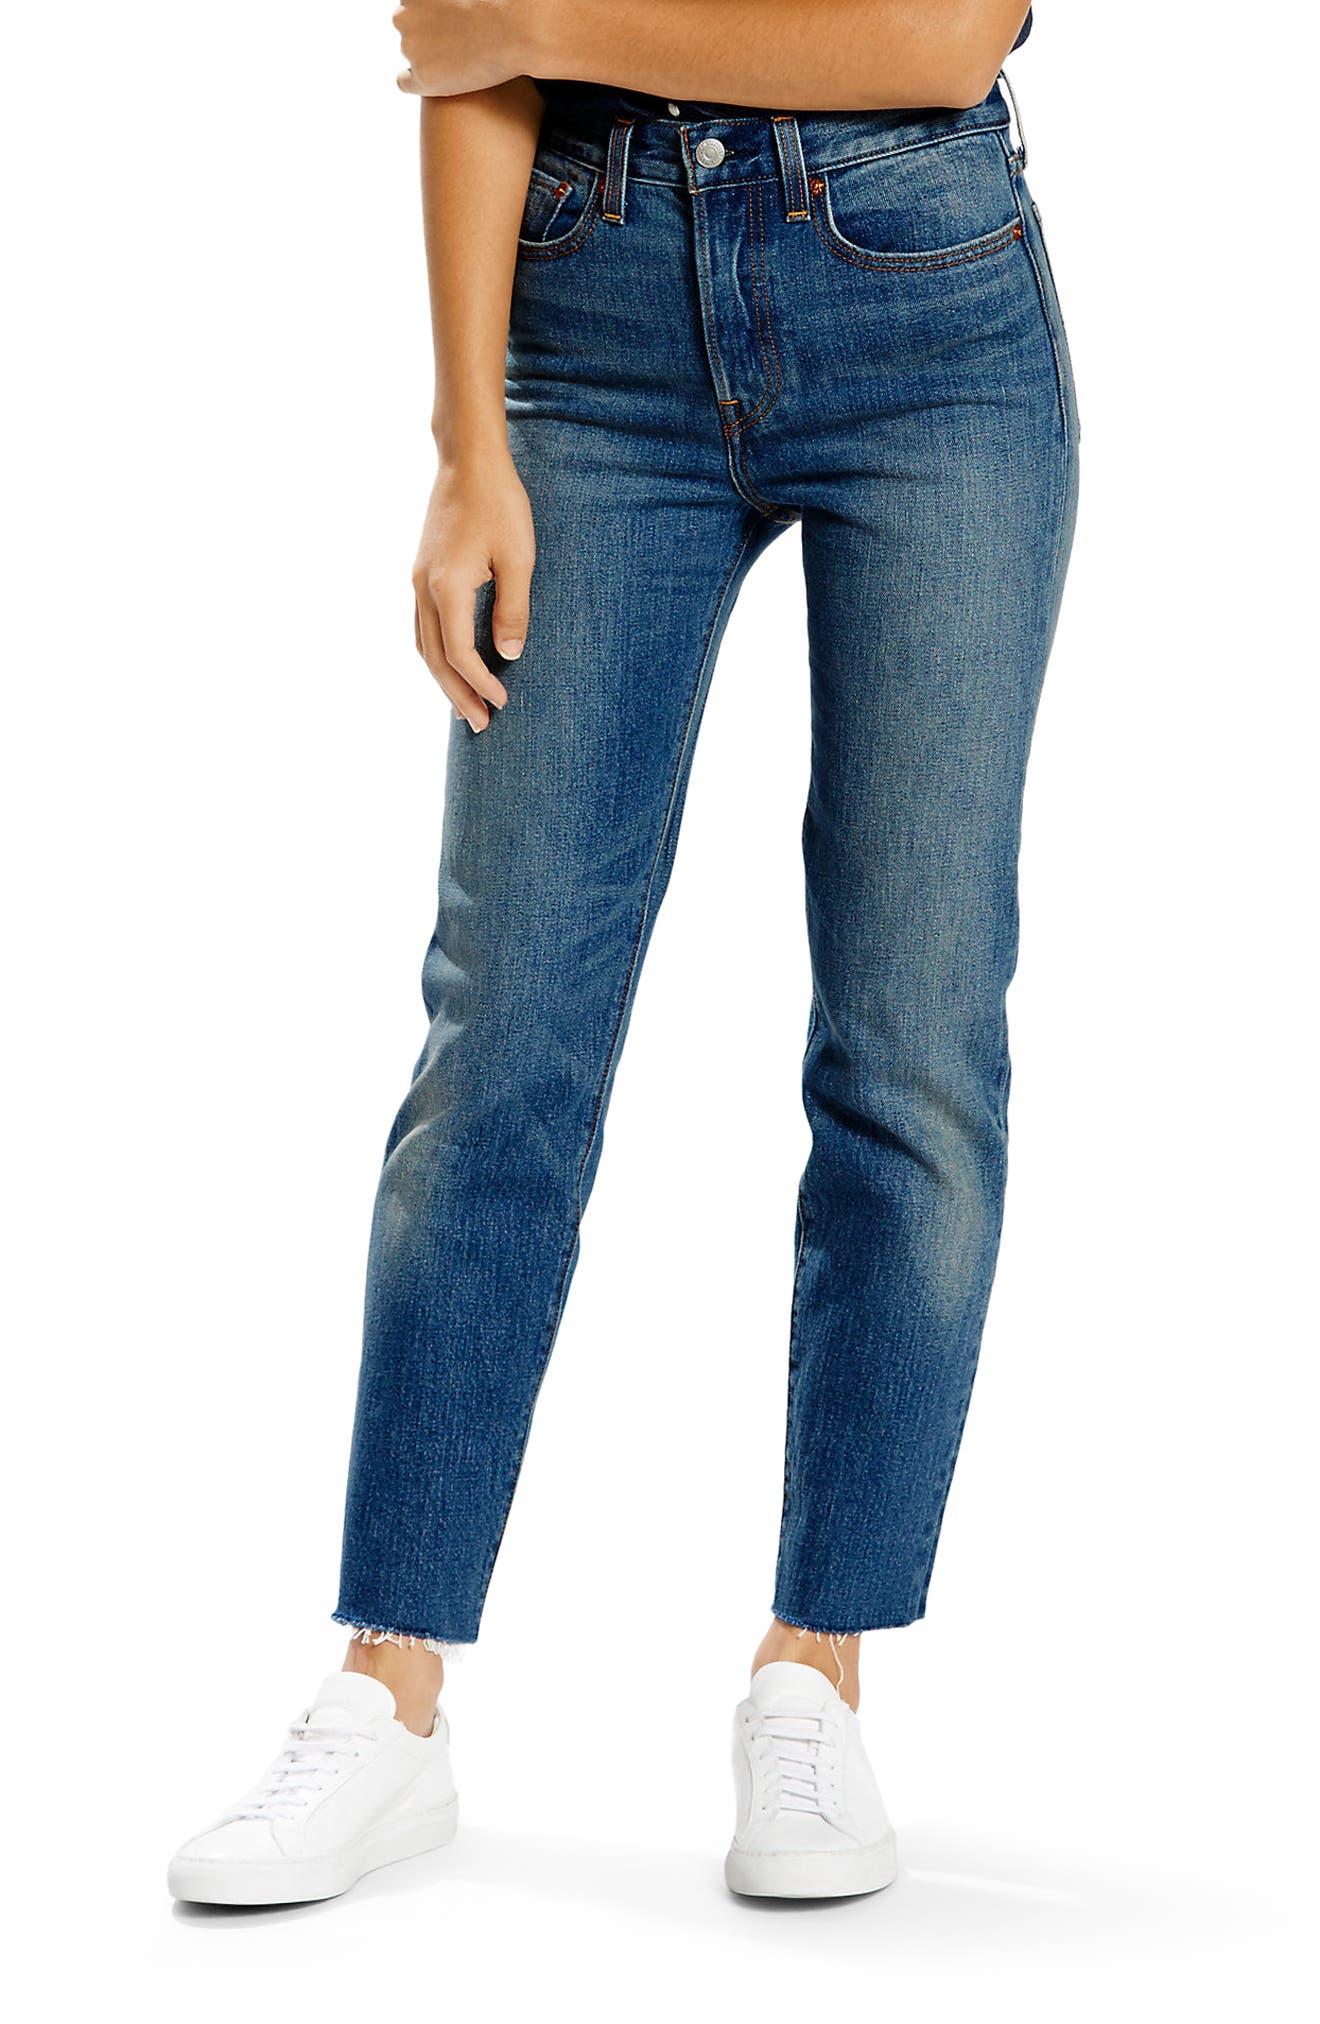 Wedgie High Waist Straight Jeans,                             Main thumbnail 1, color,                             400